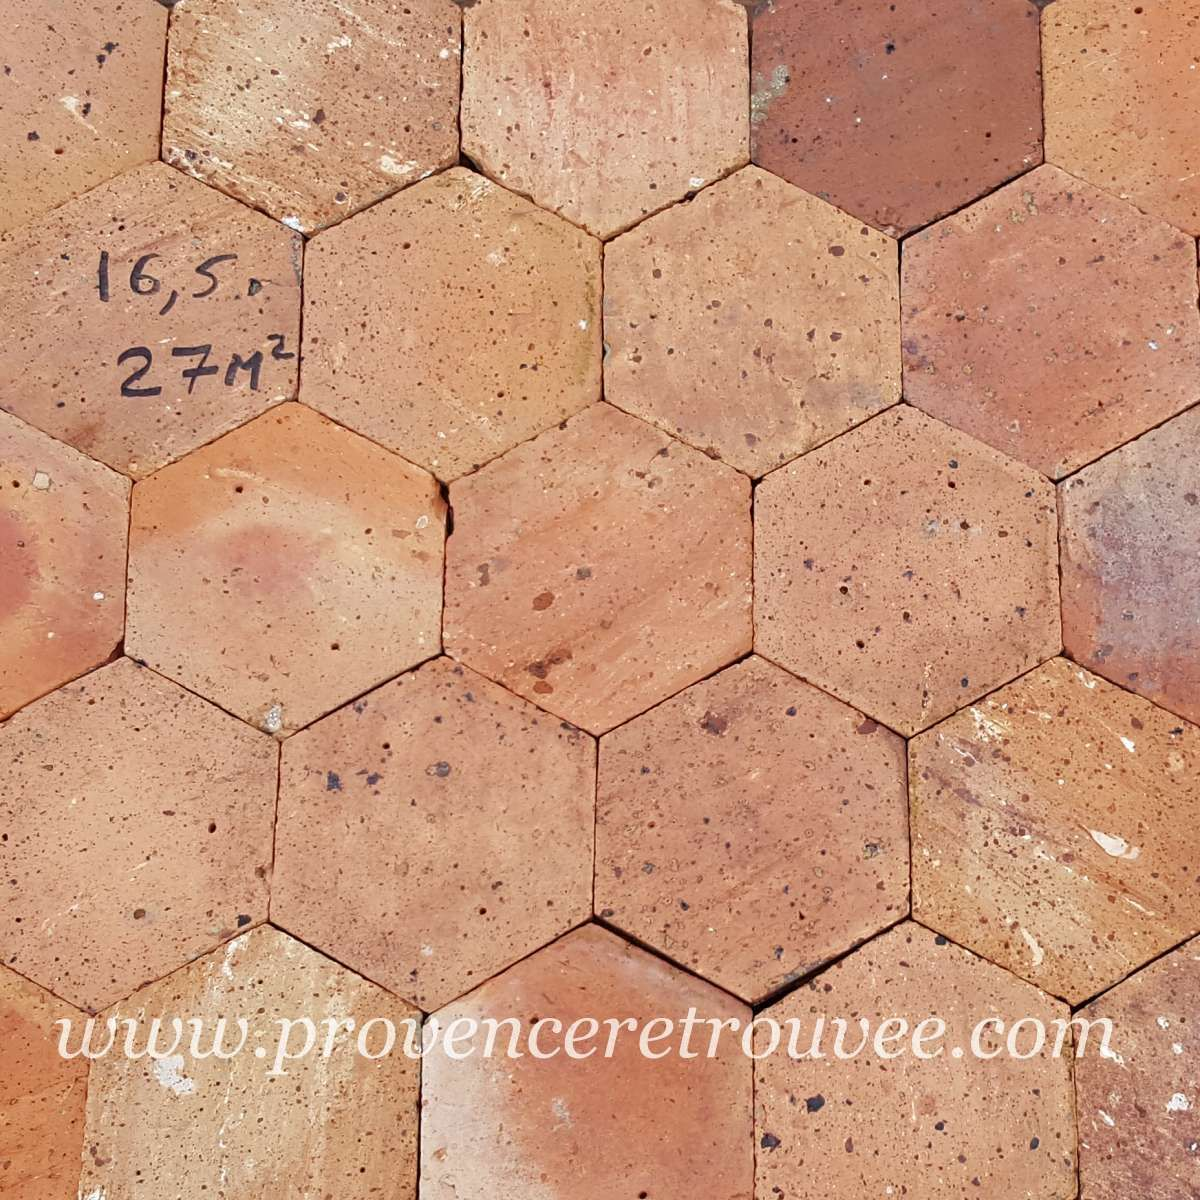 Carrelage Sol Terre Cuite 20 X 20 Cm Hexagonale Vendu Au Carton Sol Terre Cuite Terre Cuite Carrelage Terre Cuite